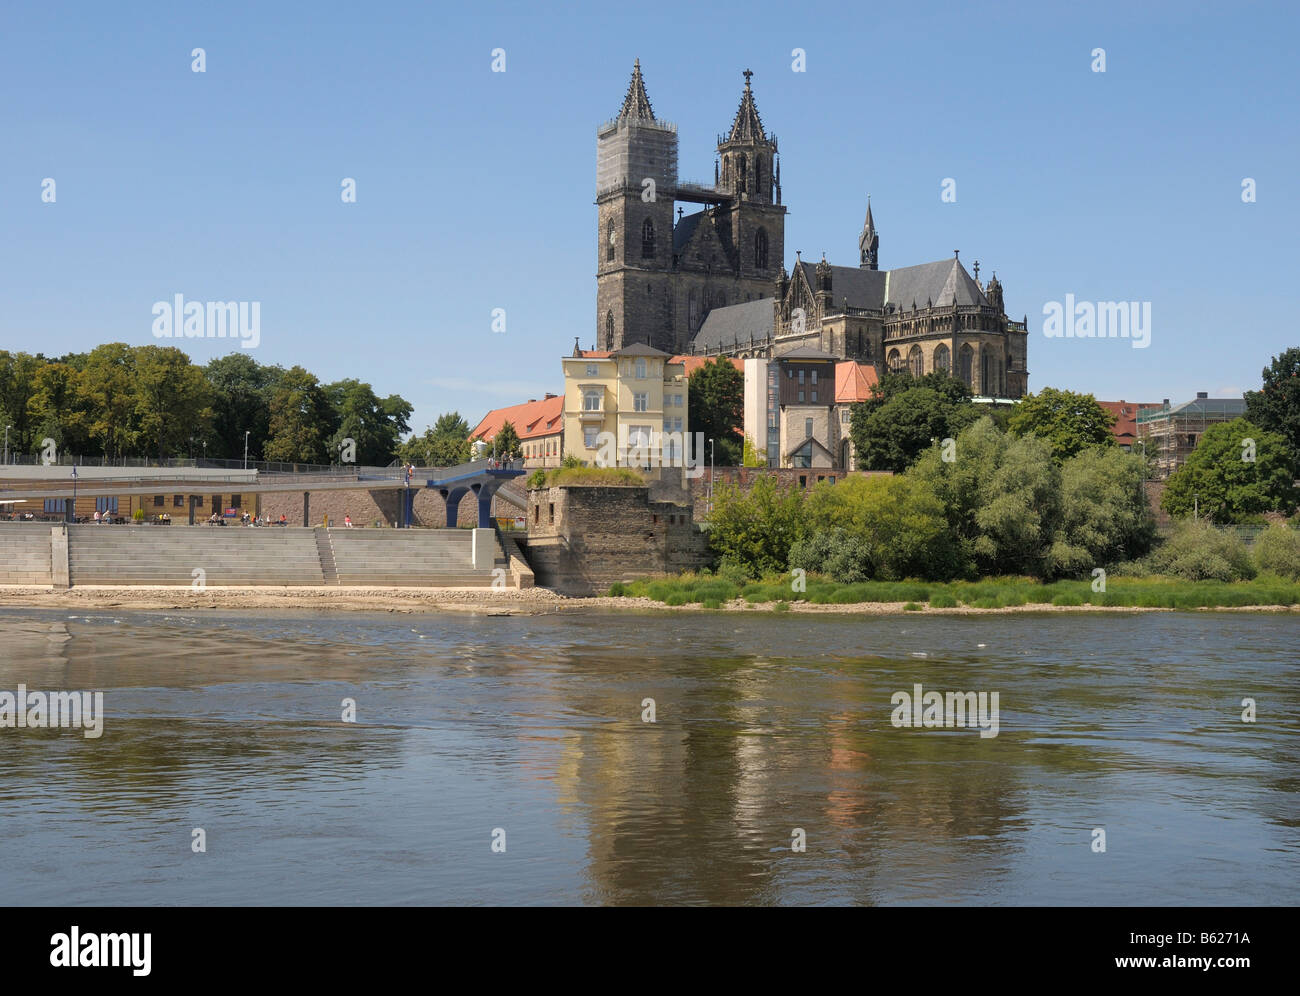 Saint Mauritius Saint Katharina Cathedral, Magdeburg, Saxony-Anhalt, Germany, Europe Stock Photo